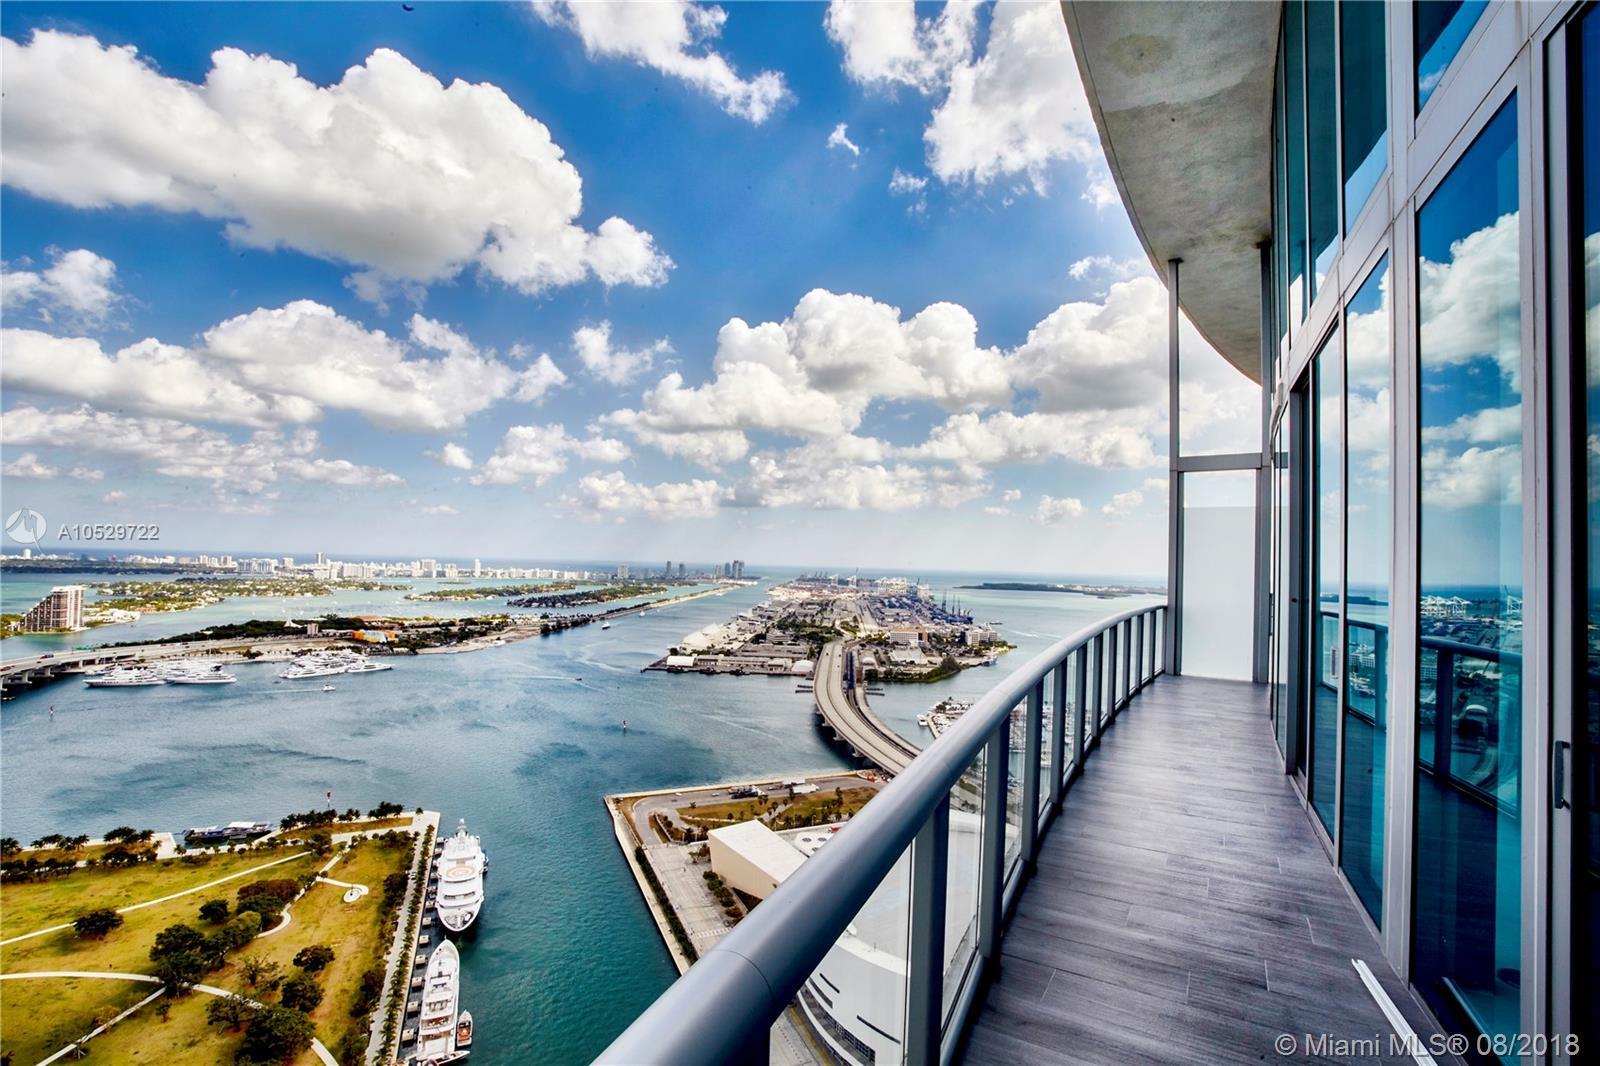 888 Biscayne Blvd, 5111 - Miami, Florida